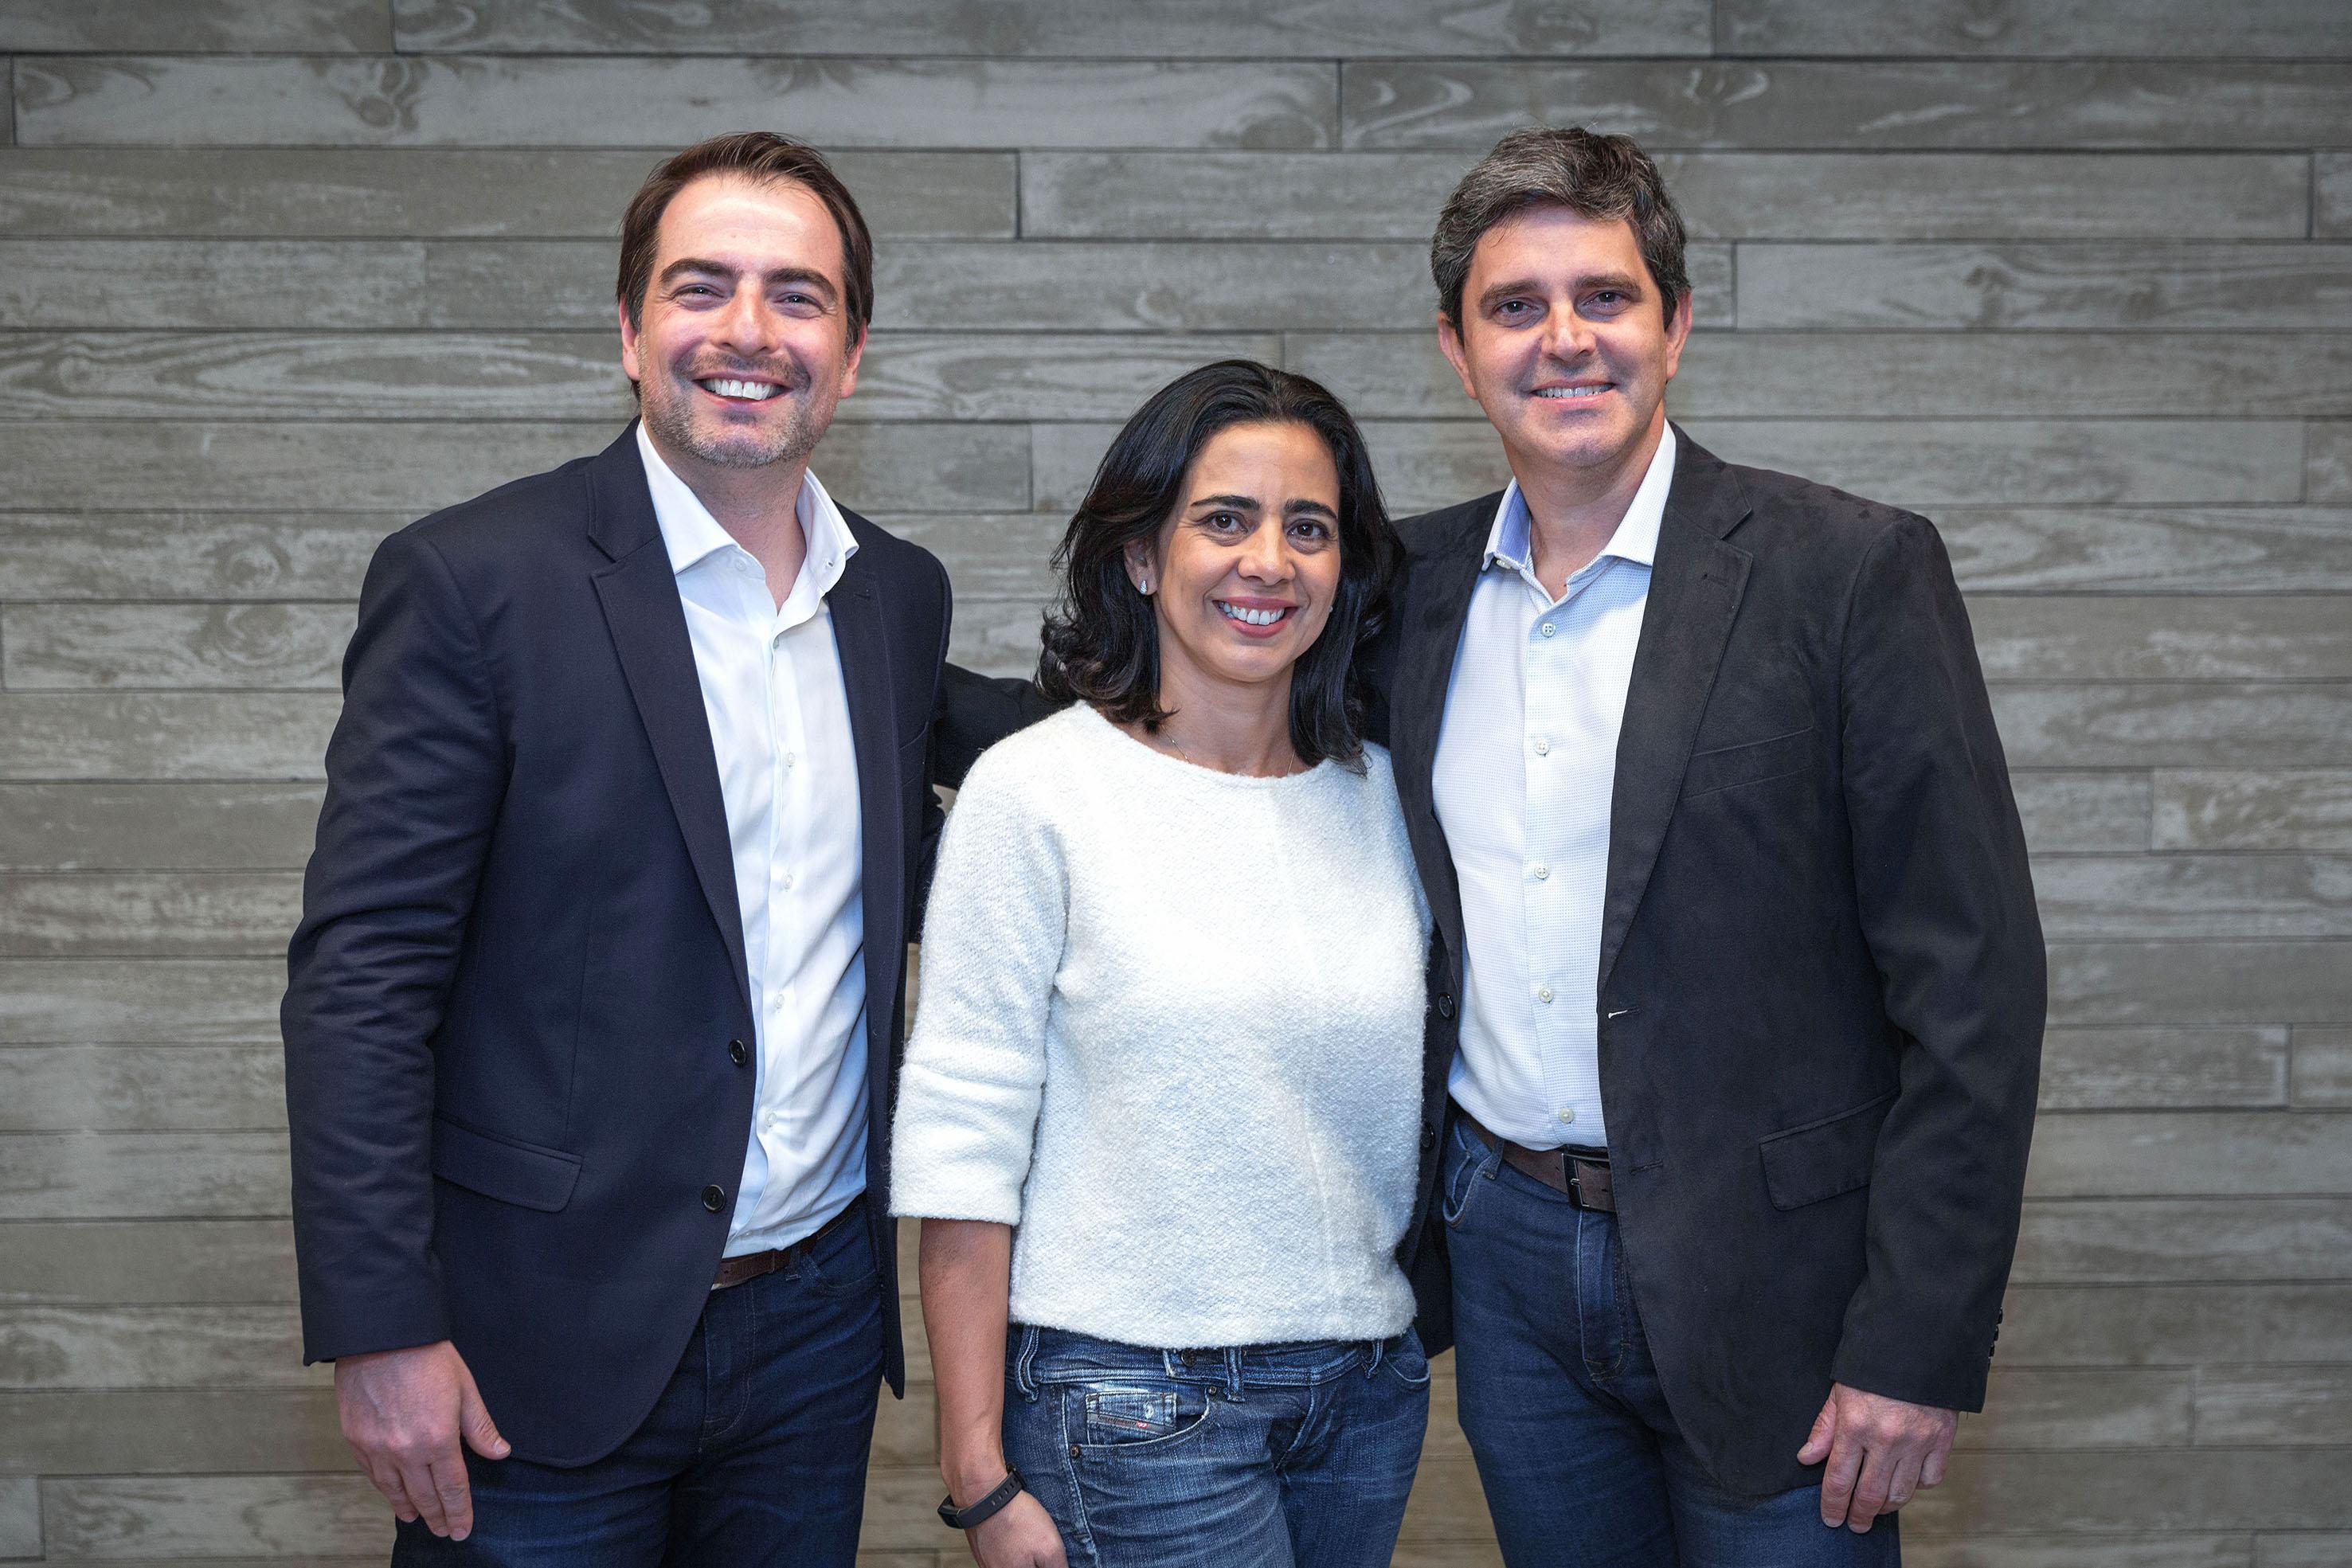 Brazil's Account Management Group Elects MullenLowe's Robert Filshill as President